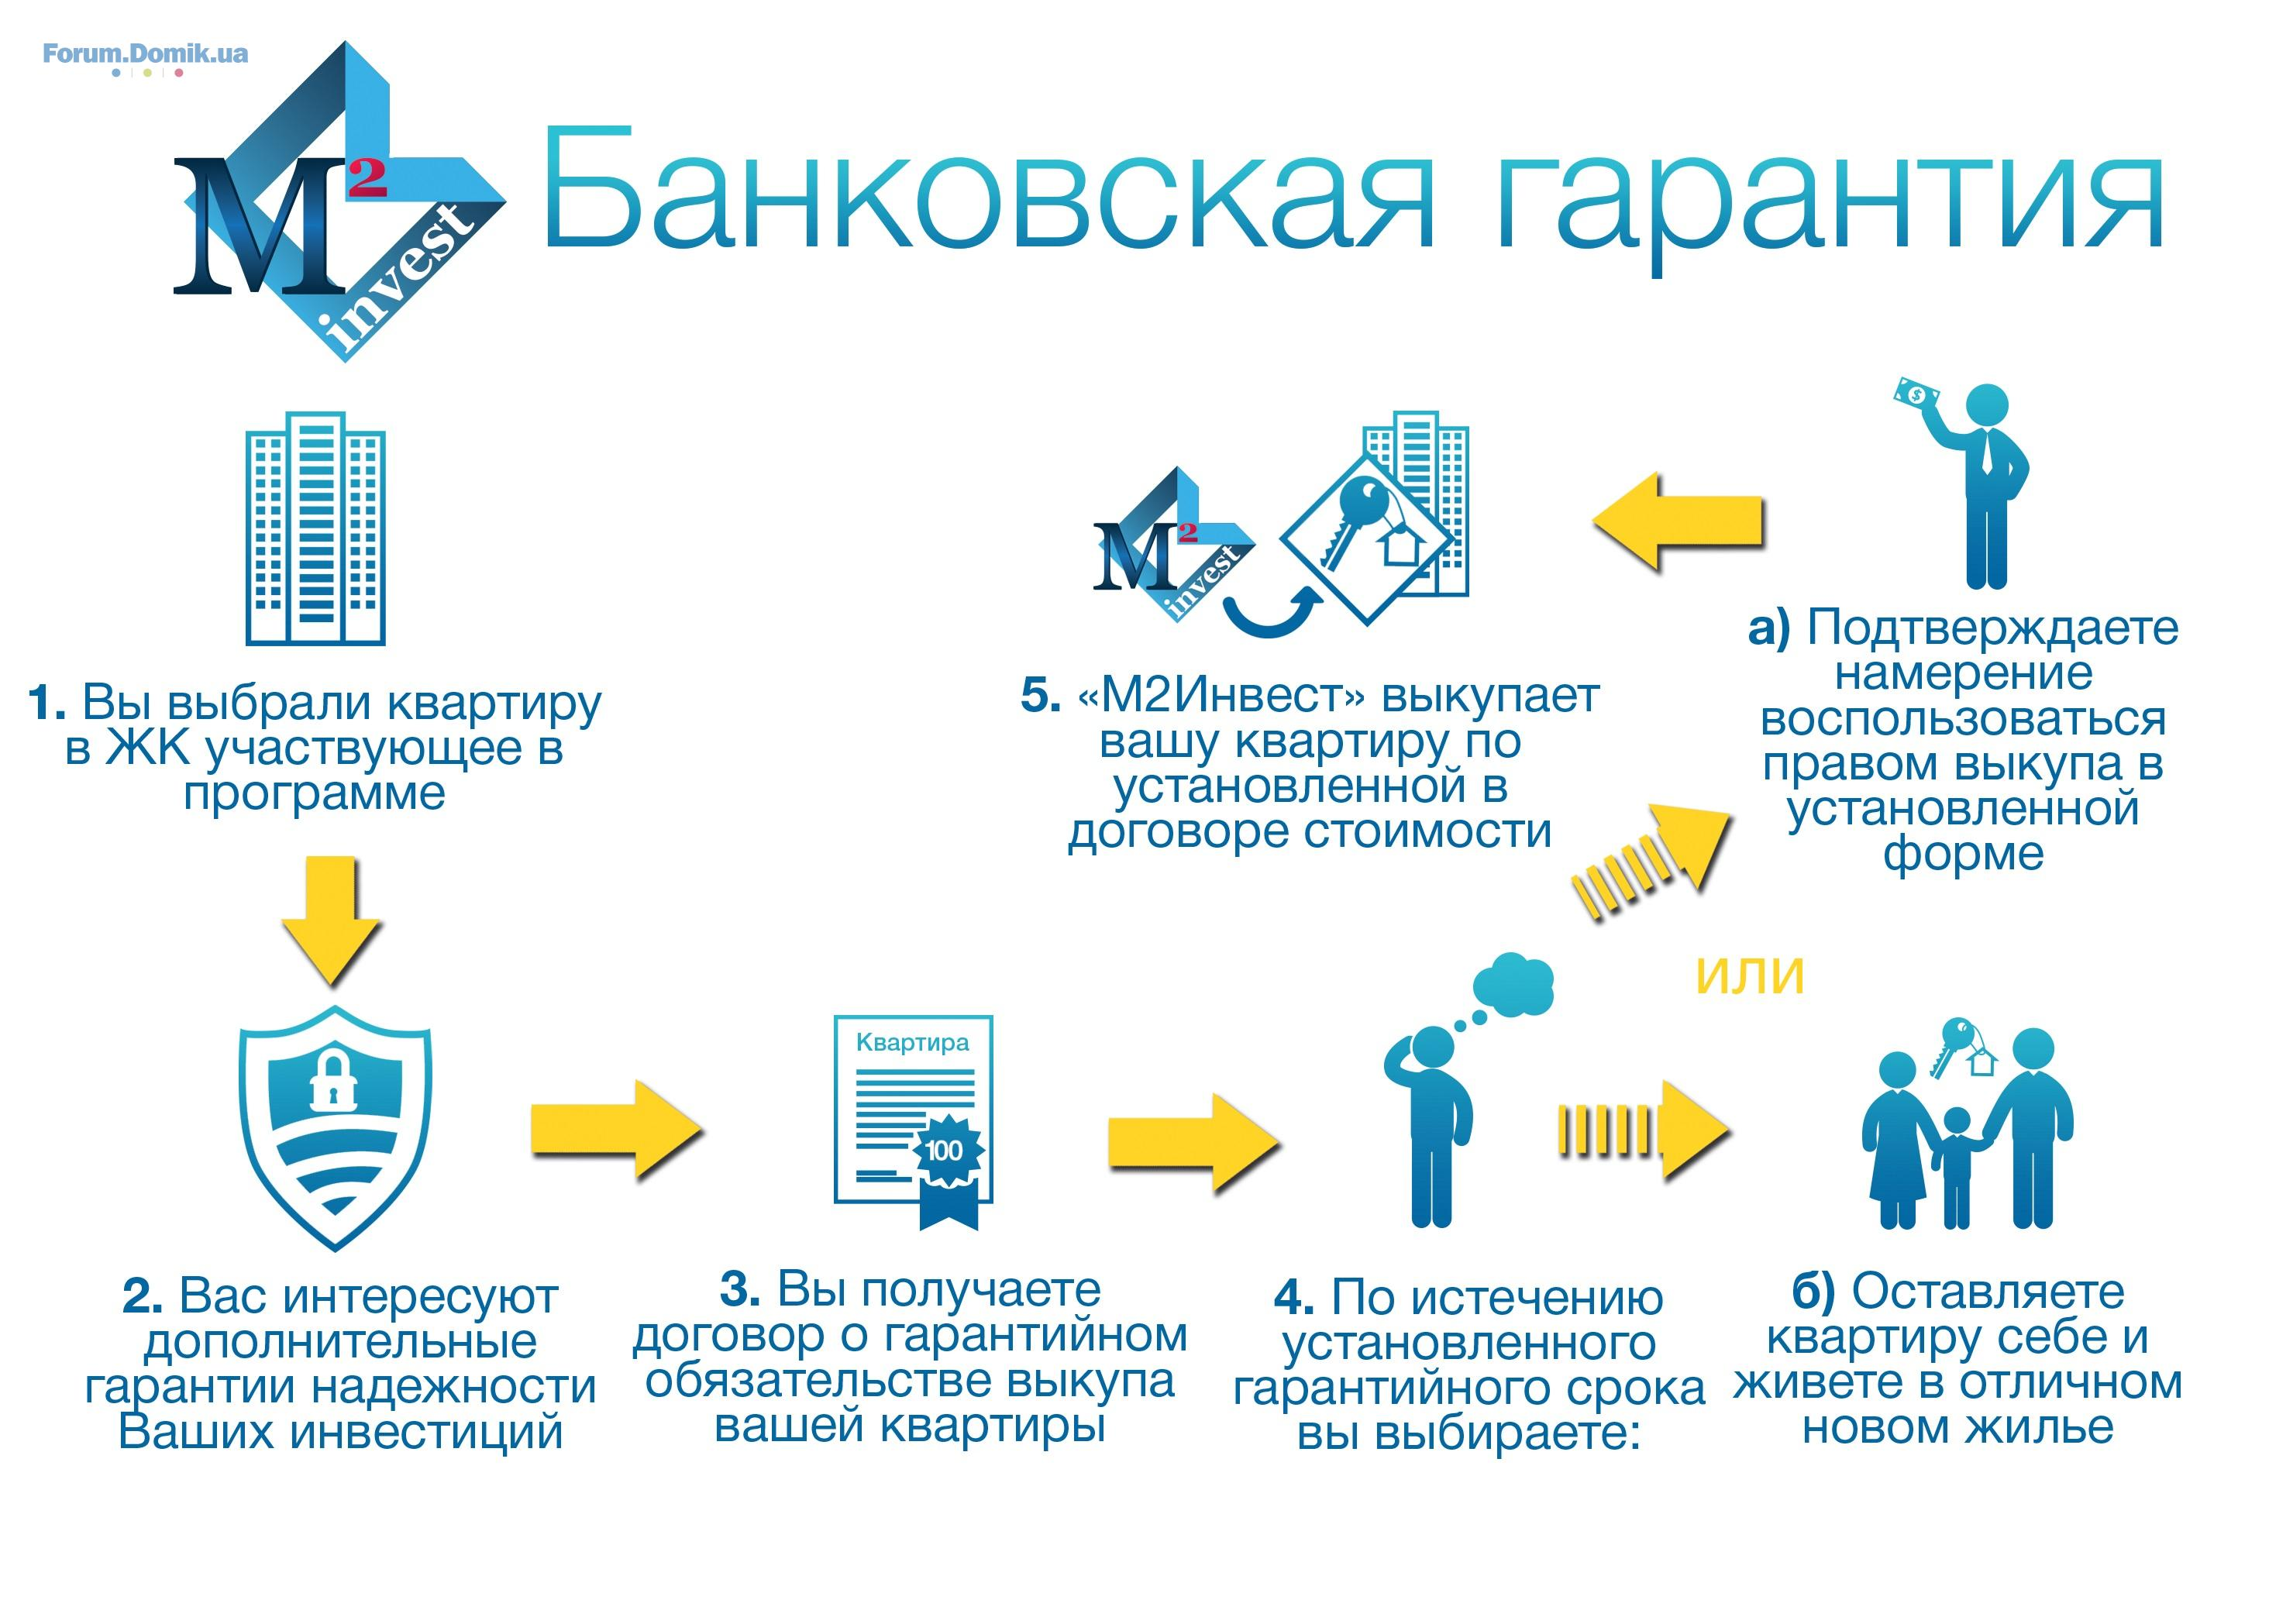 Порядок, условия и сроки выдачи банковских гарантий